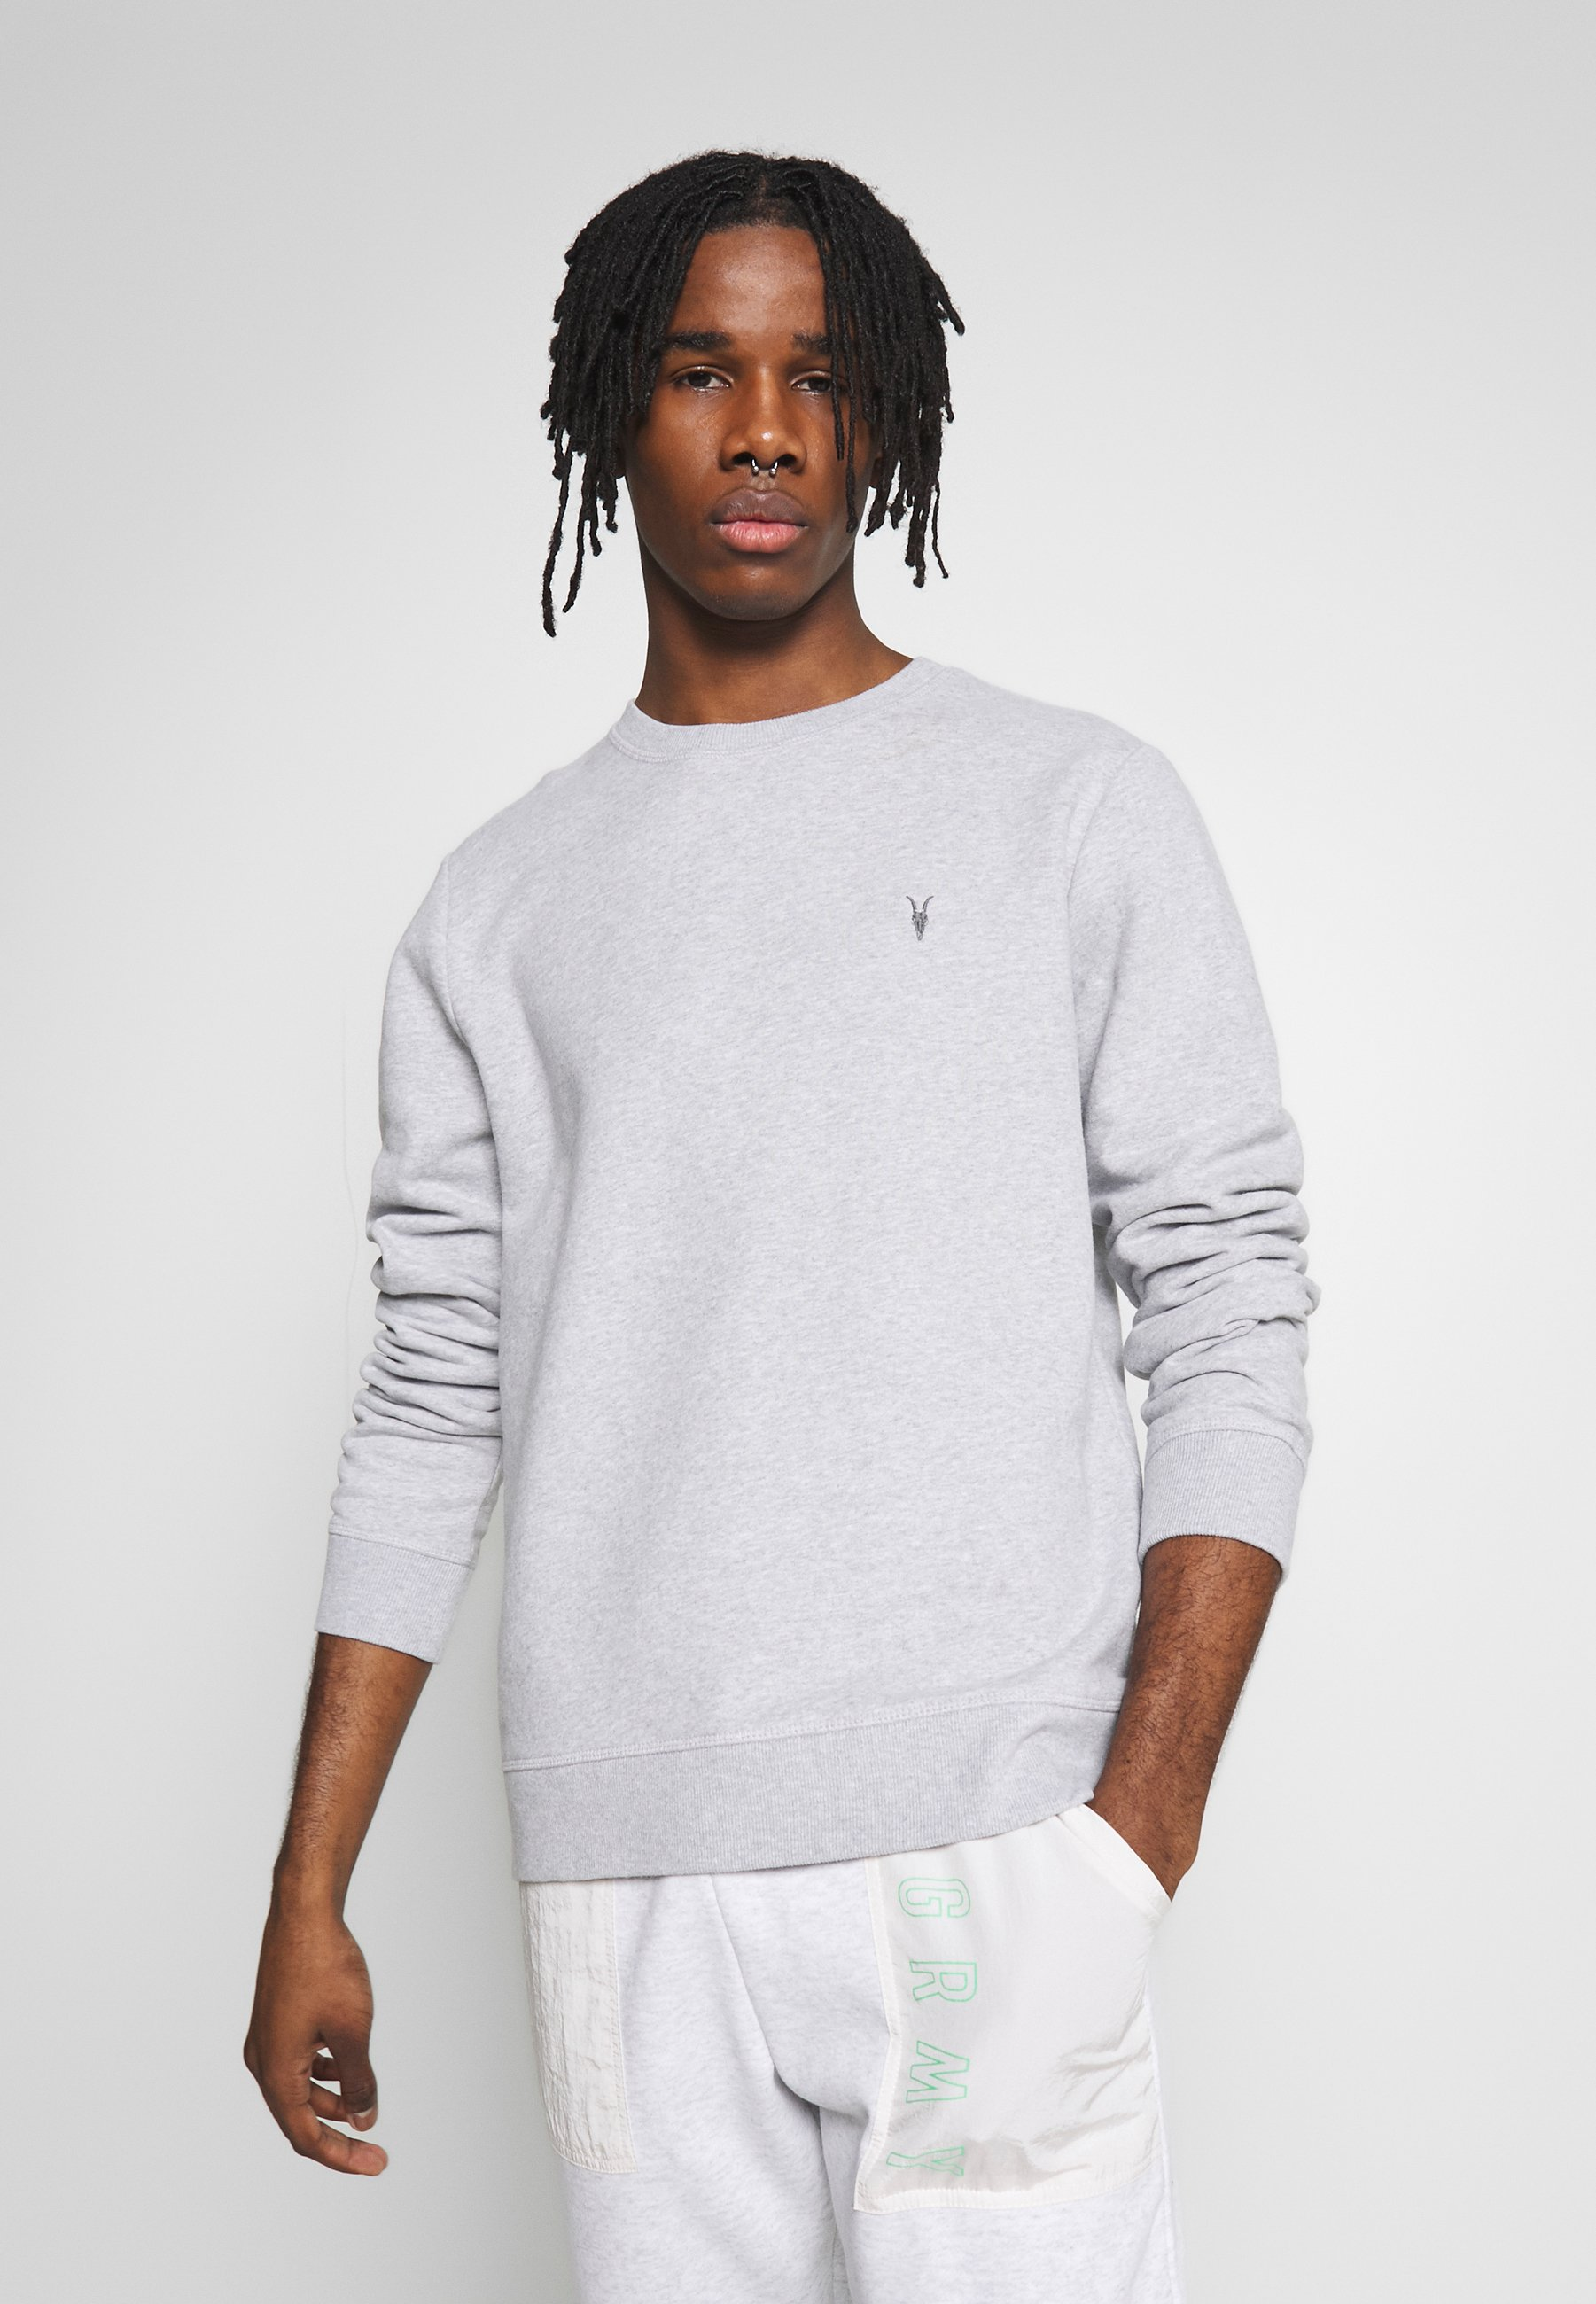 New And Fashion Online Cheapest Men's Clothing AllSaints RAVEN CREW Sweatshirt grey marl OLDbsKS7y VpkTb9zEO